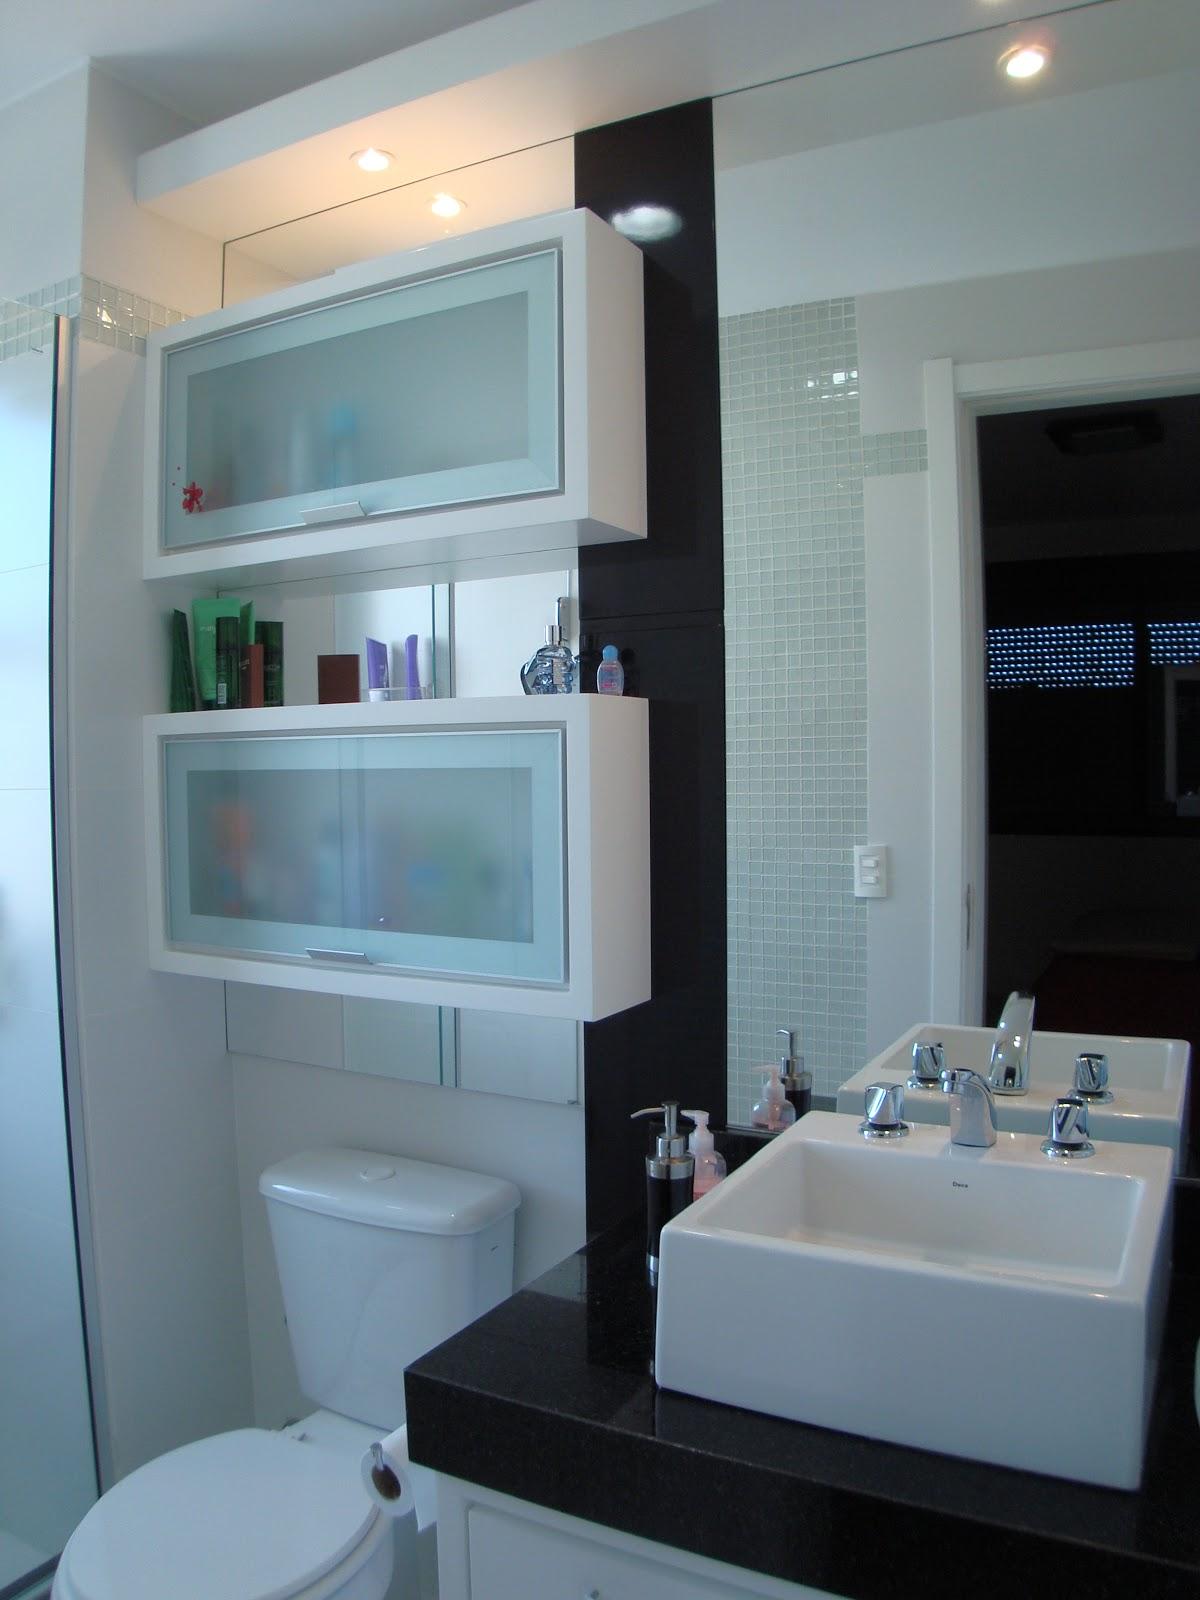 Andréa Pereira Interiores: Banheiros #826A49 1200x1600 Banheiro Azulejo Decorado